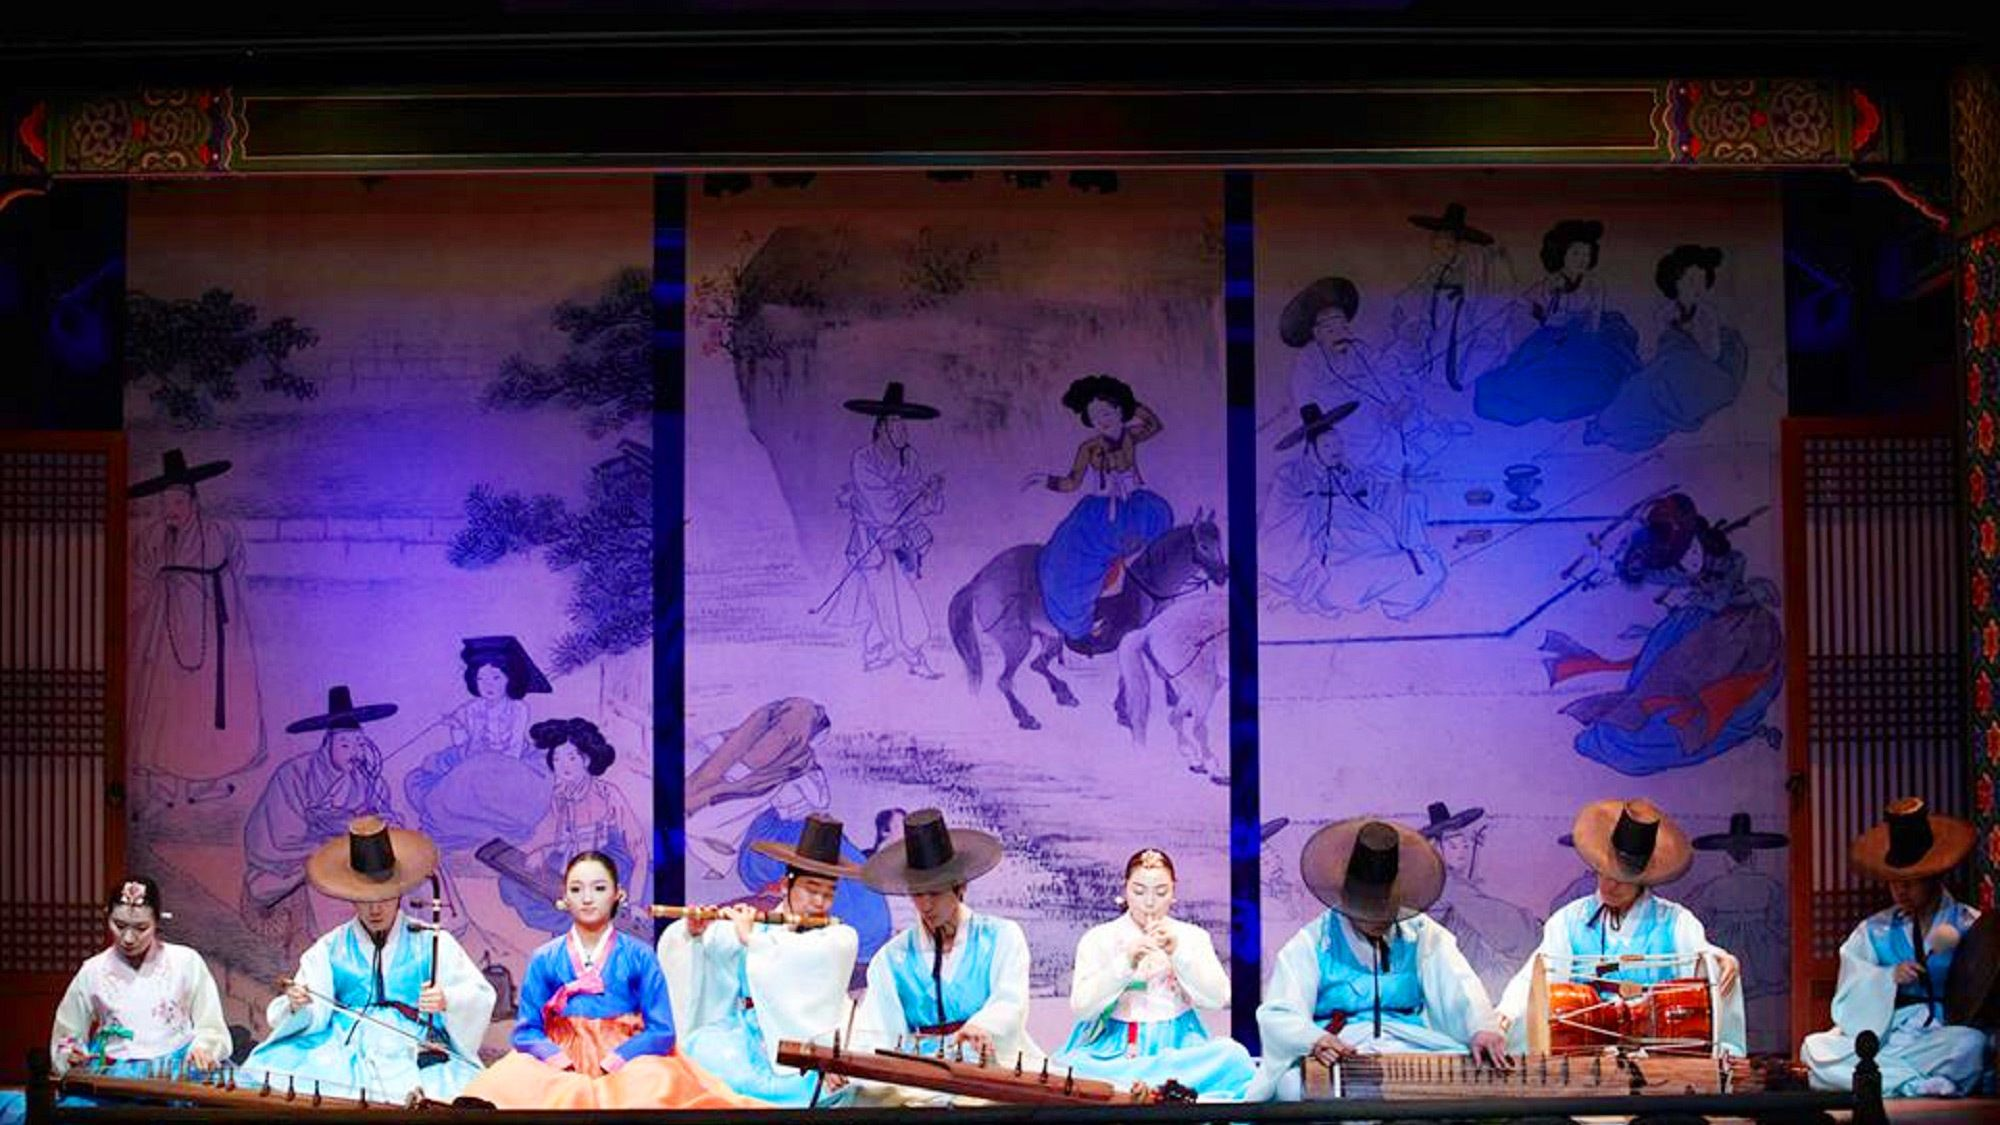 Impressive dance performance at the Korea House in Seoul